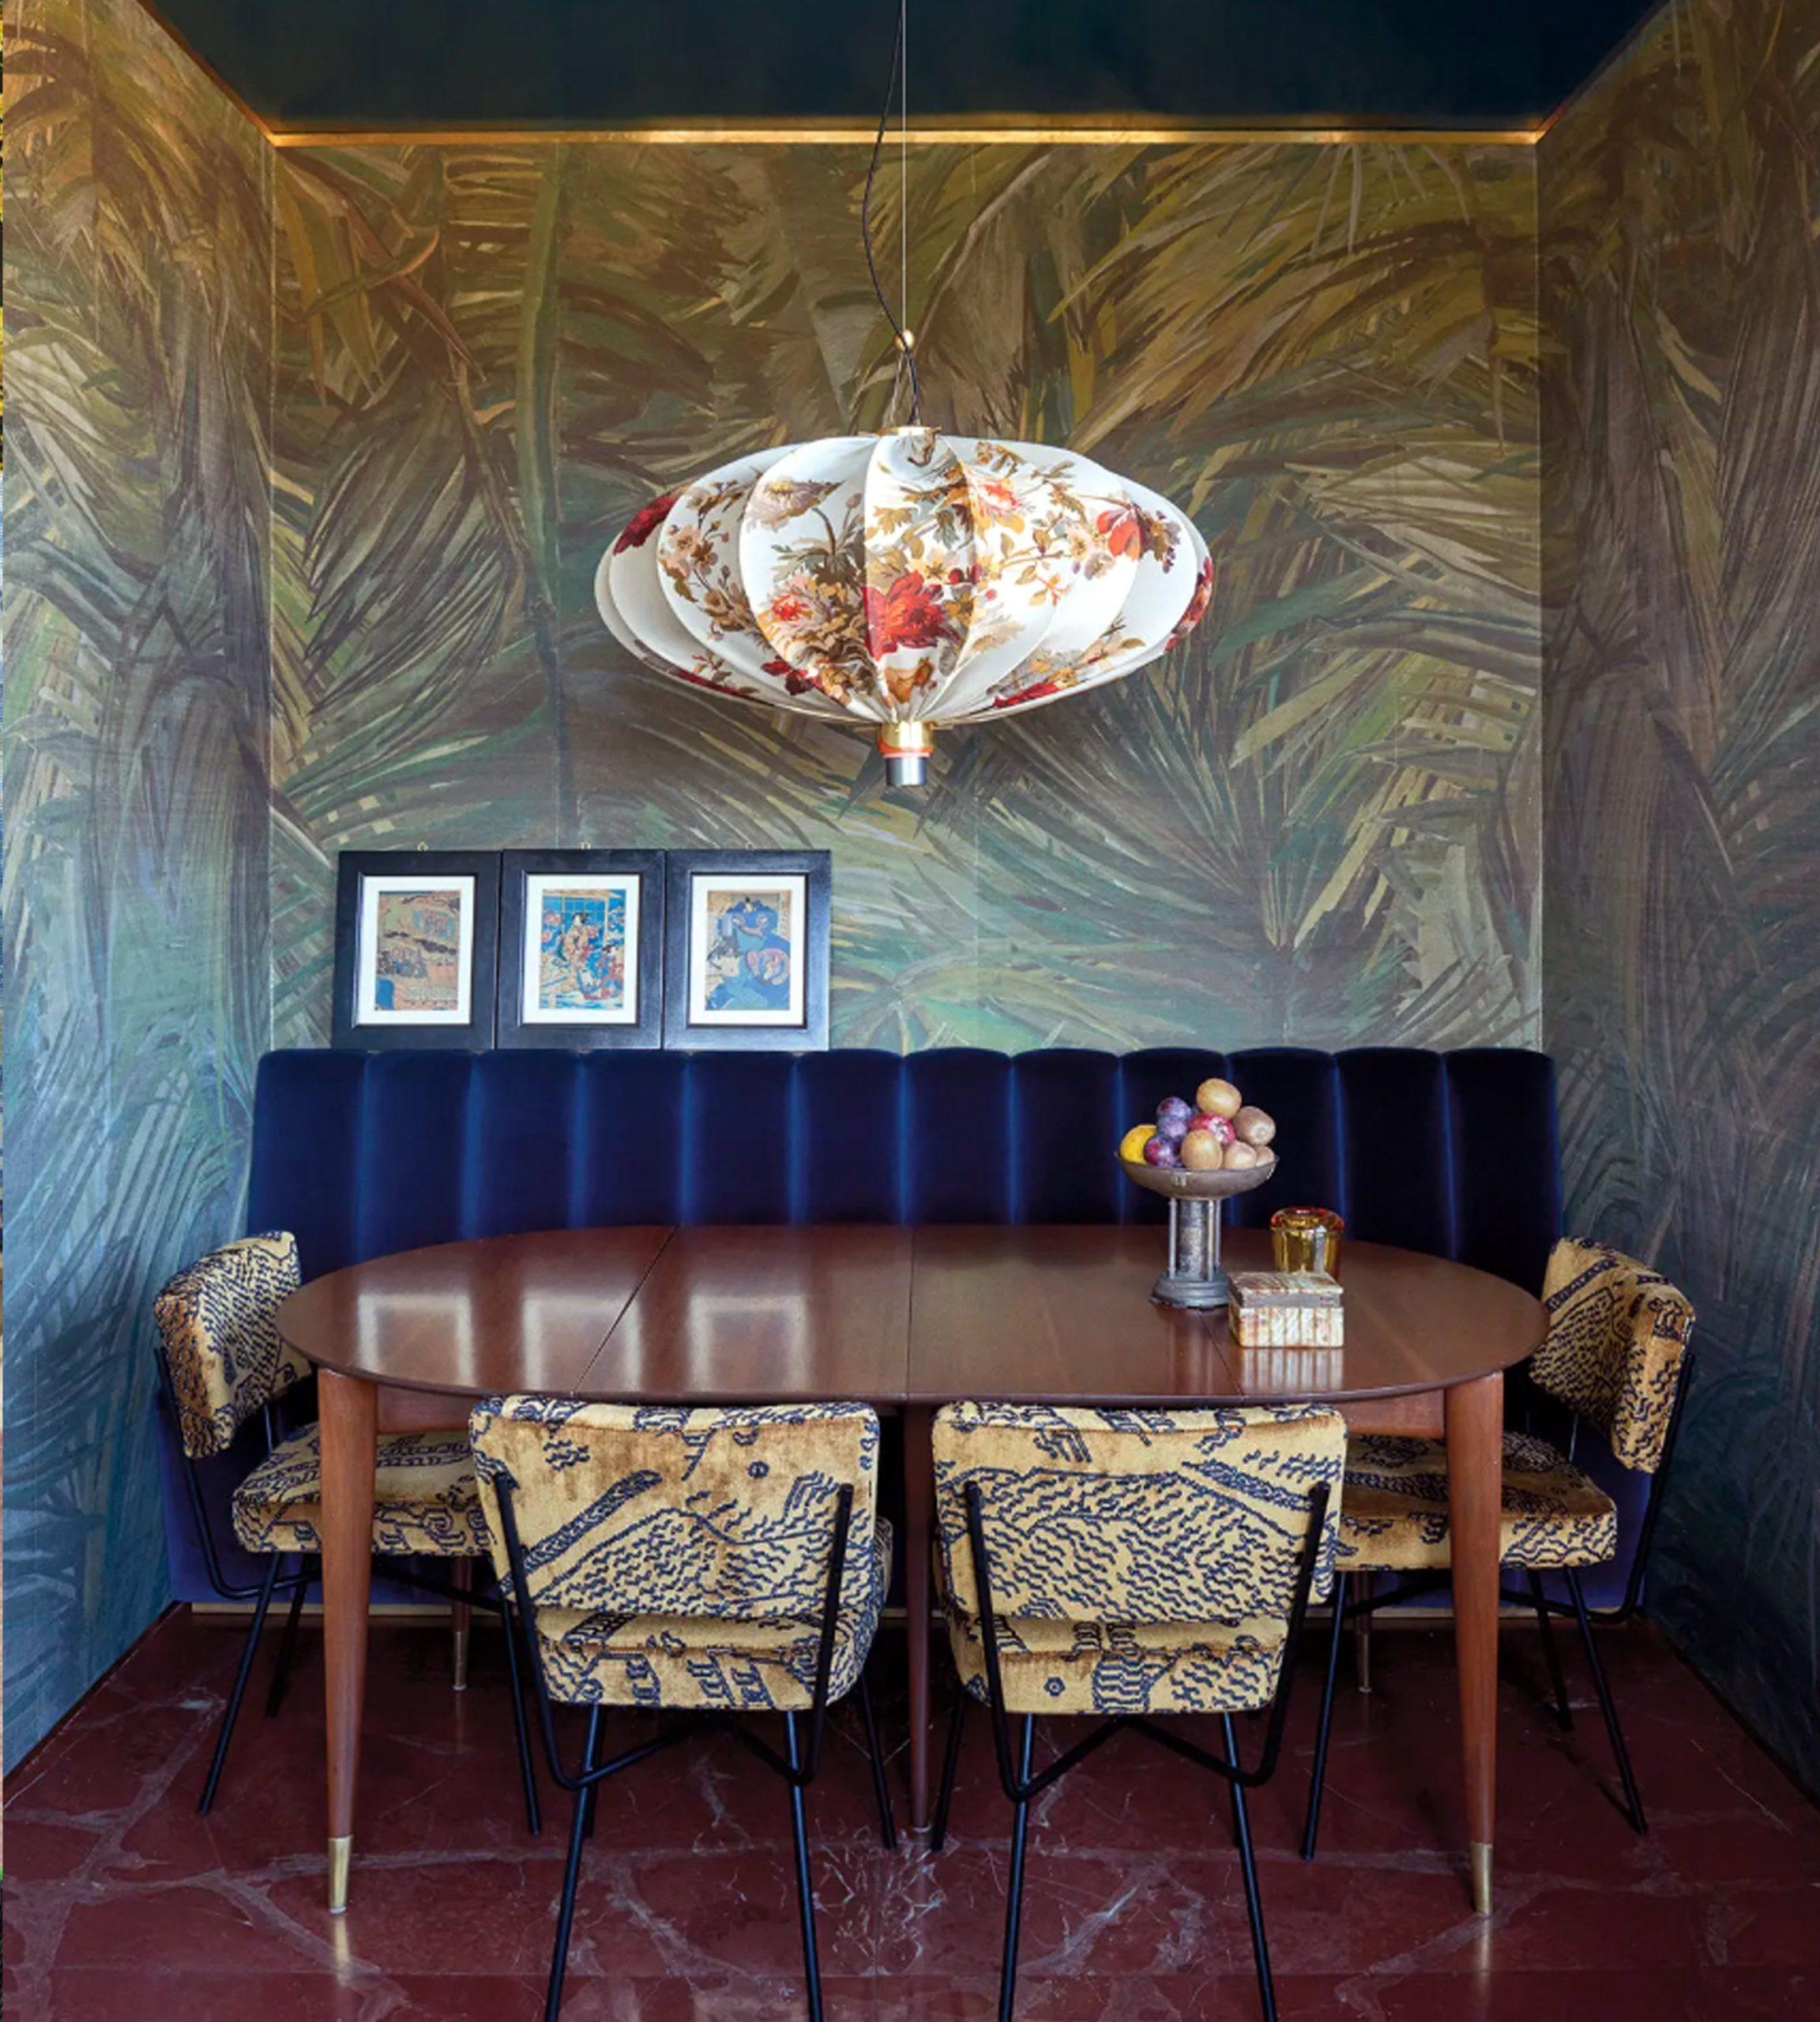 Voutsa Image 5_Grace Dimore NY Times Wallpaper Installation Florence